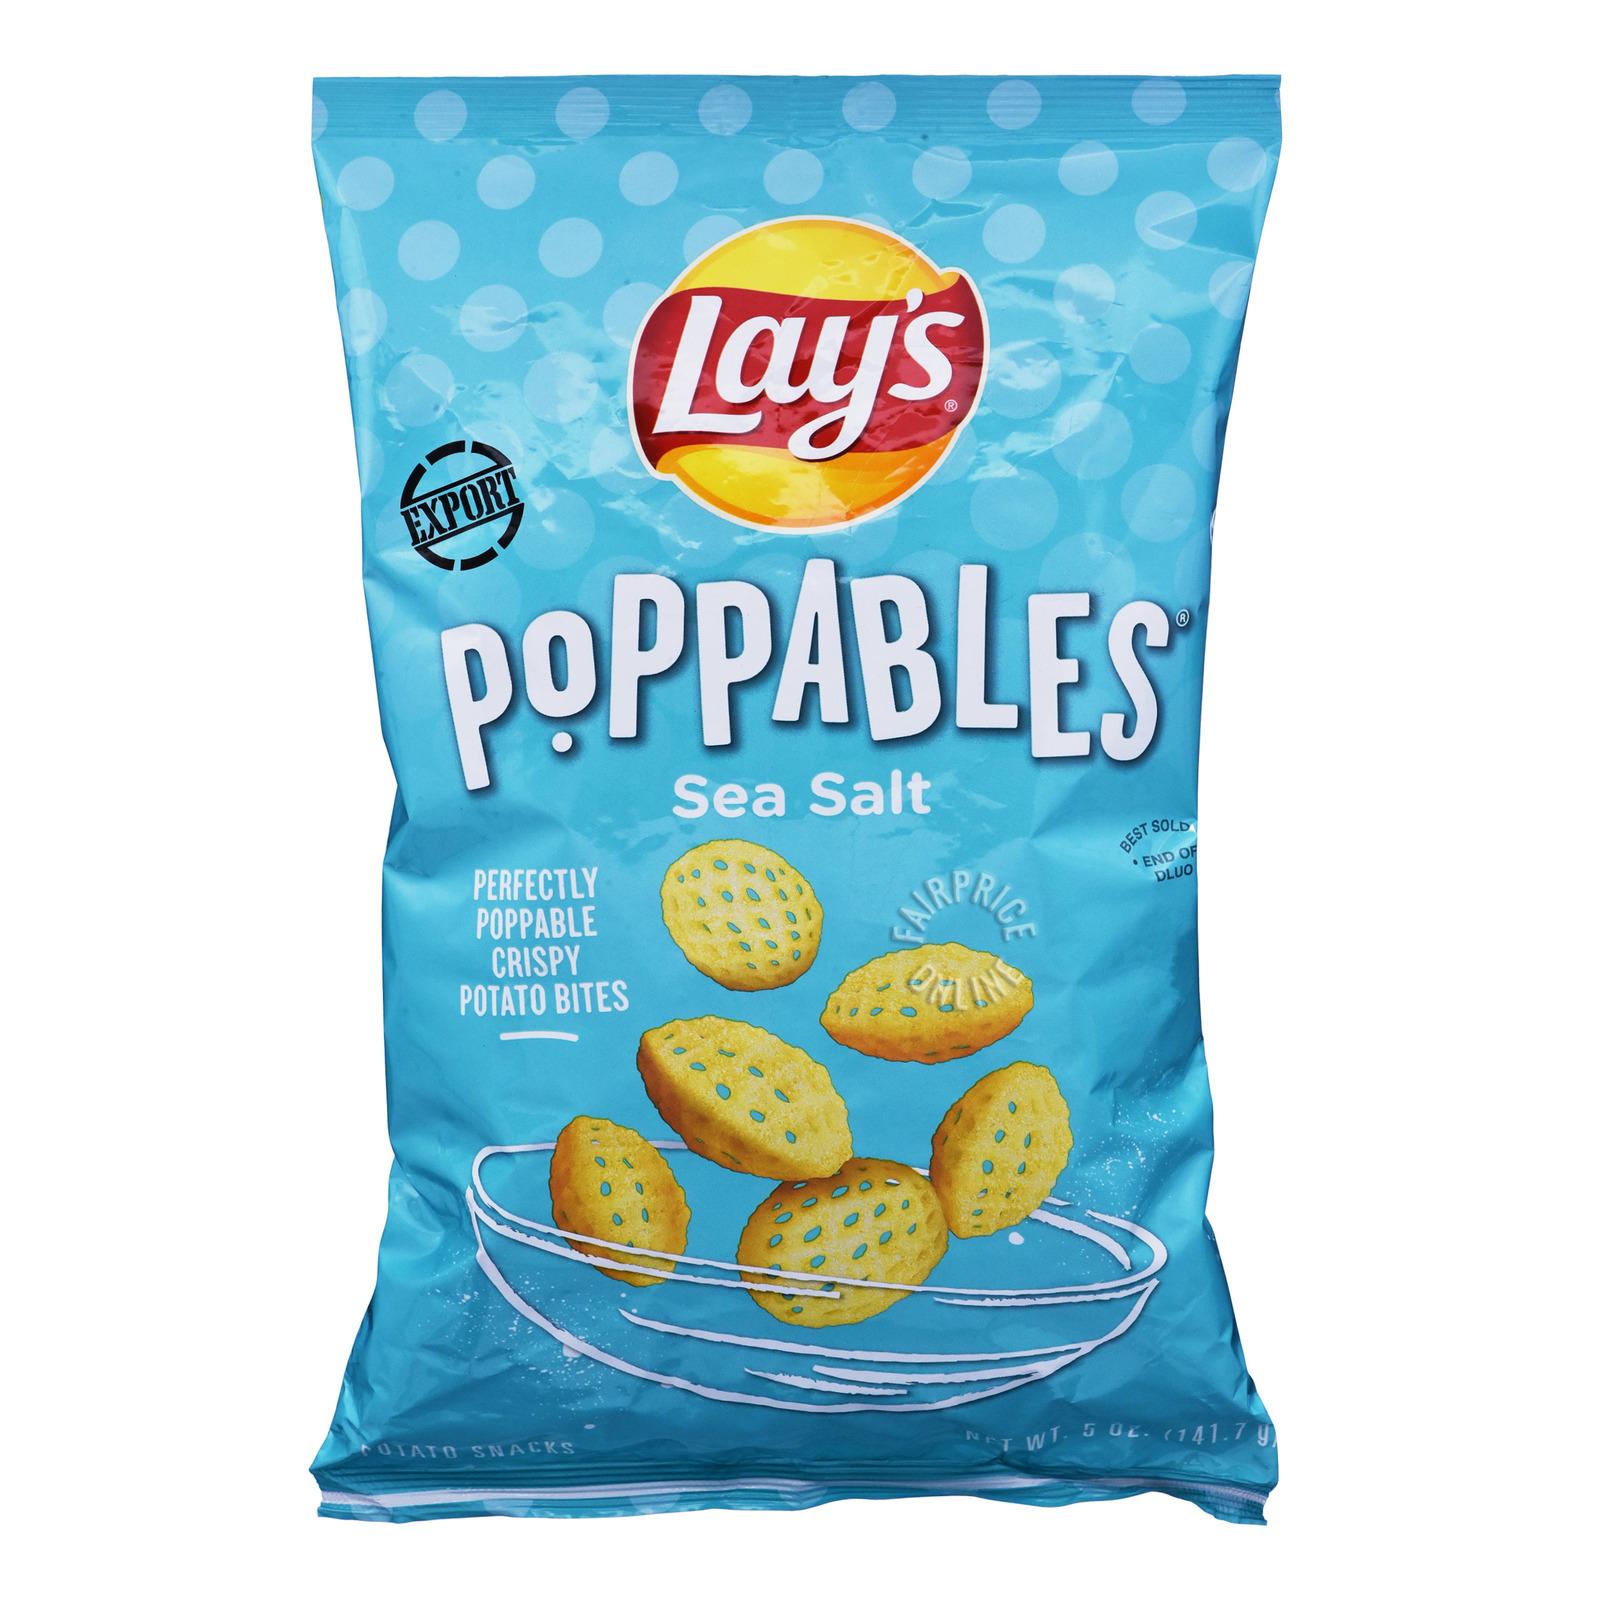 Lay's Poppables Potato Bites - Sea Salt